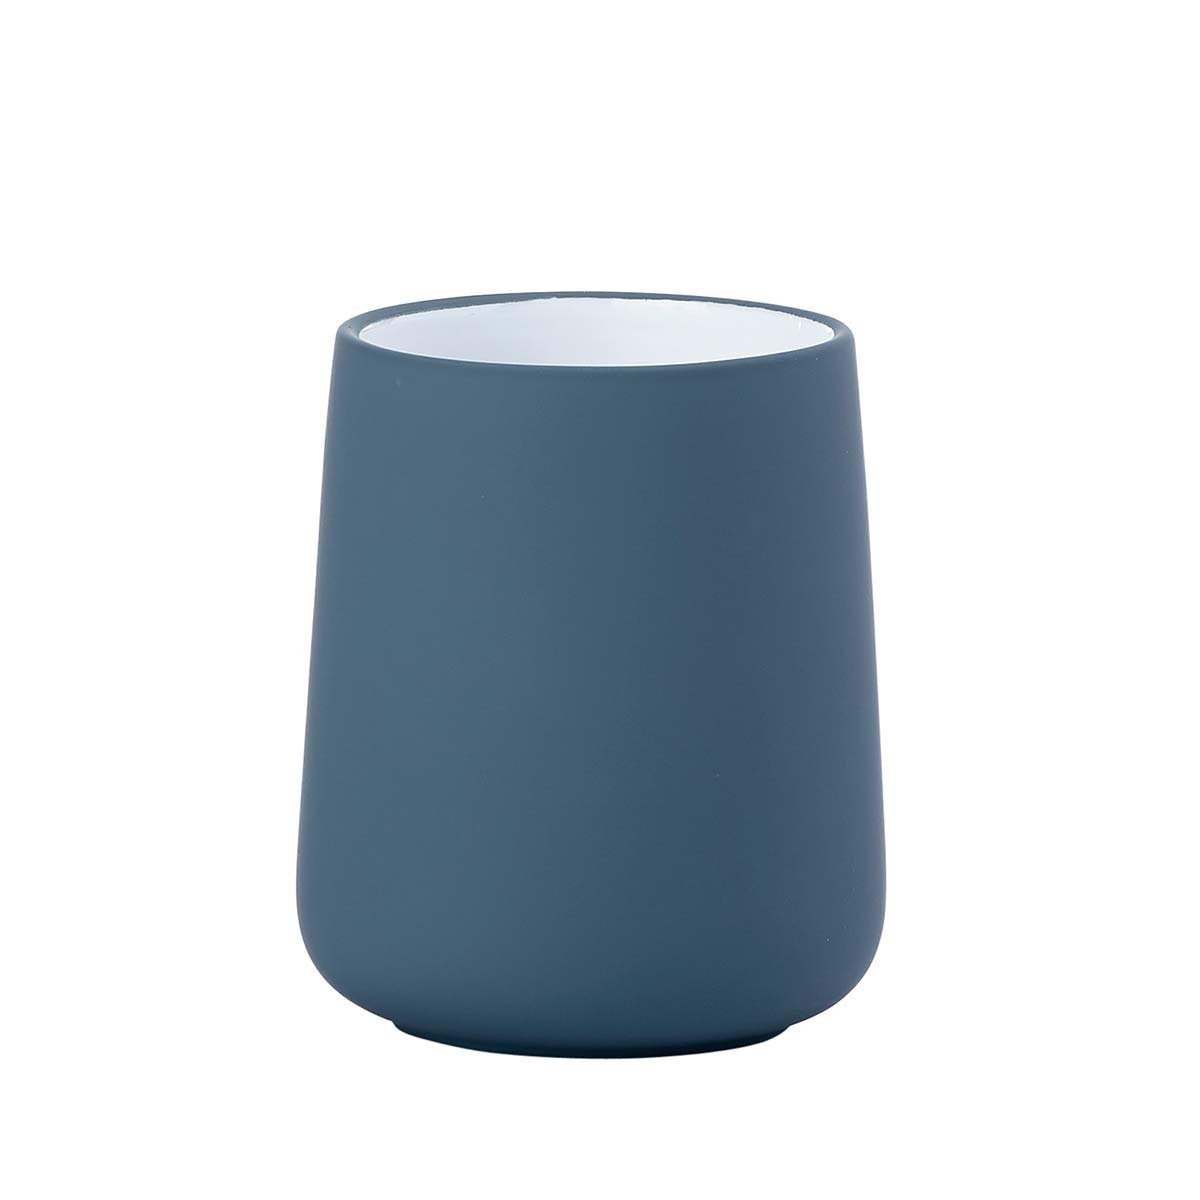 Zone Denmark Nova Toothbrush Mug, AZURE BLUE 362001